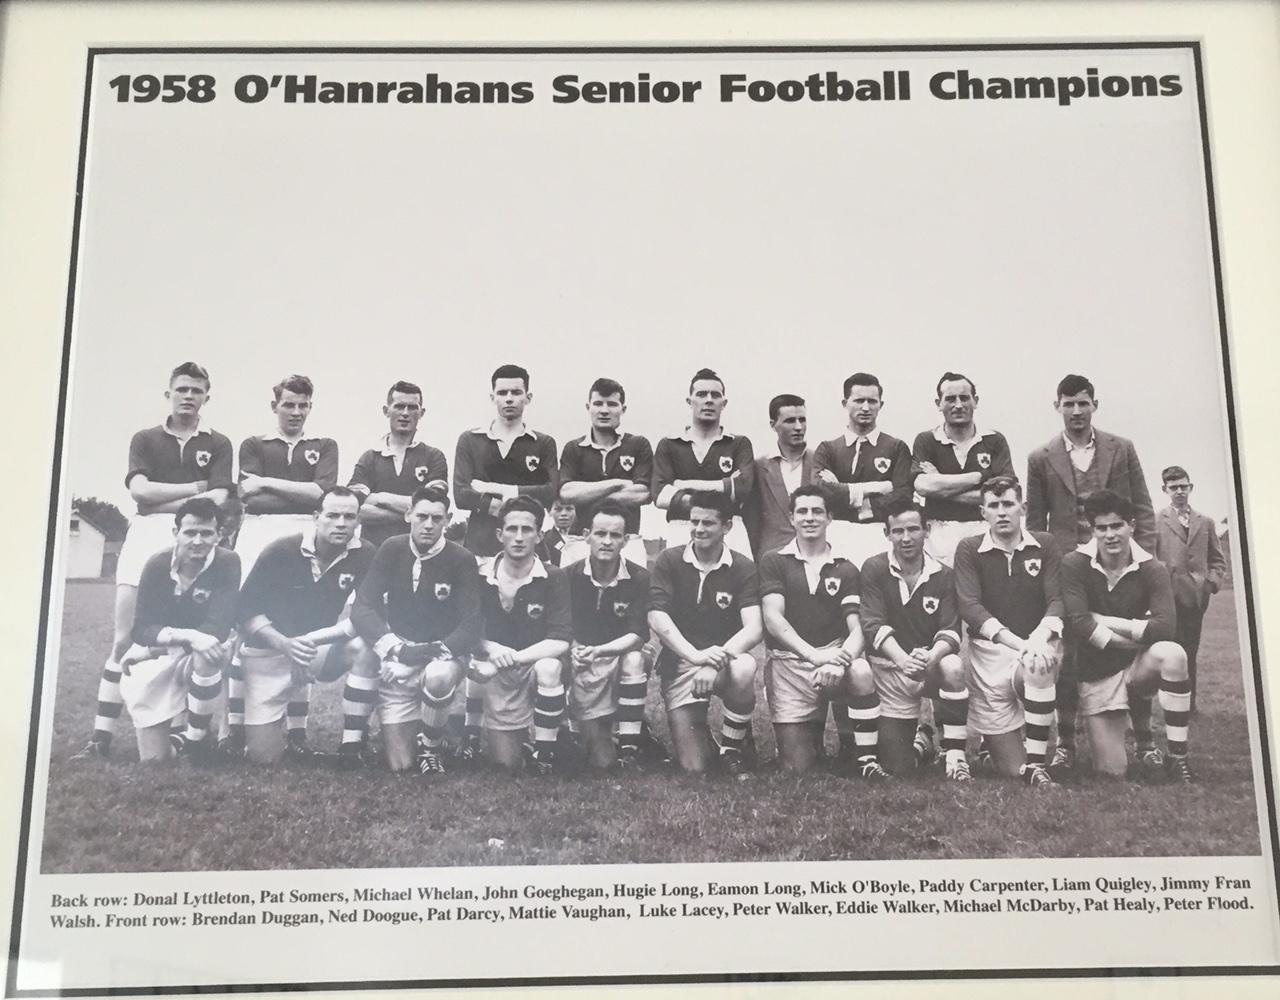 archive slot: 1958 football champs o'hanrahans